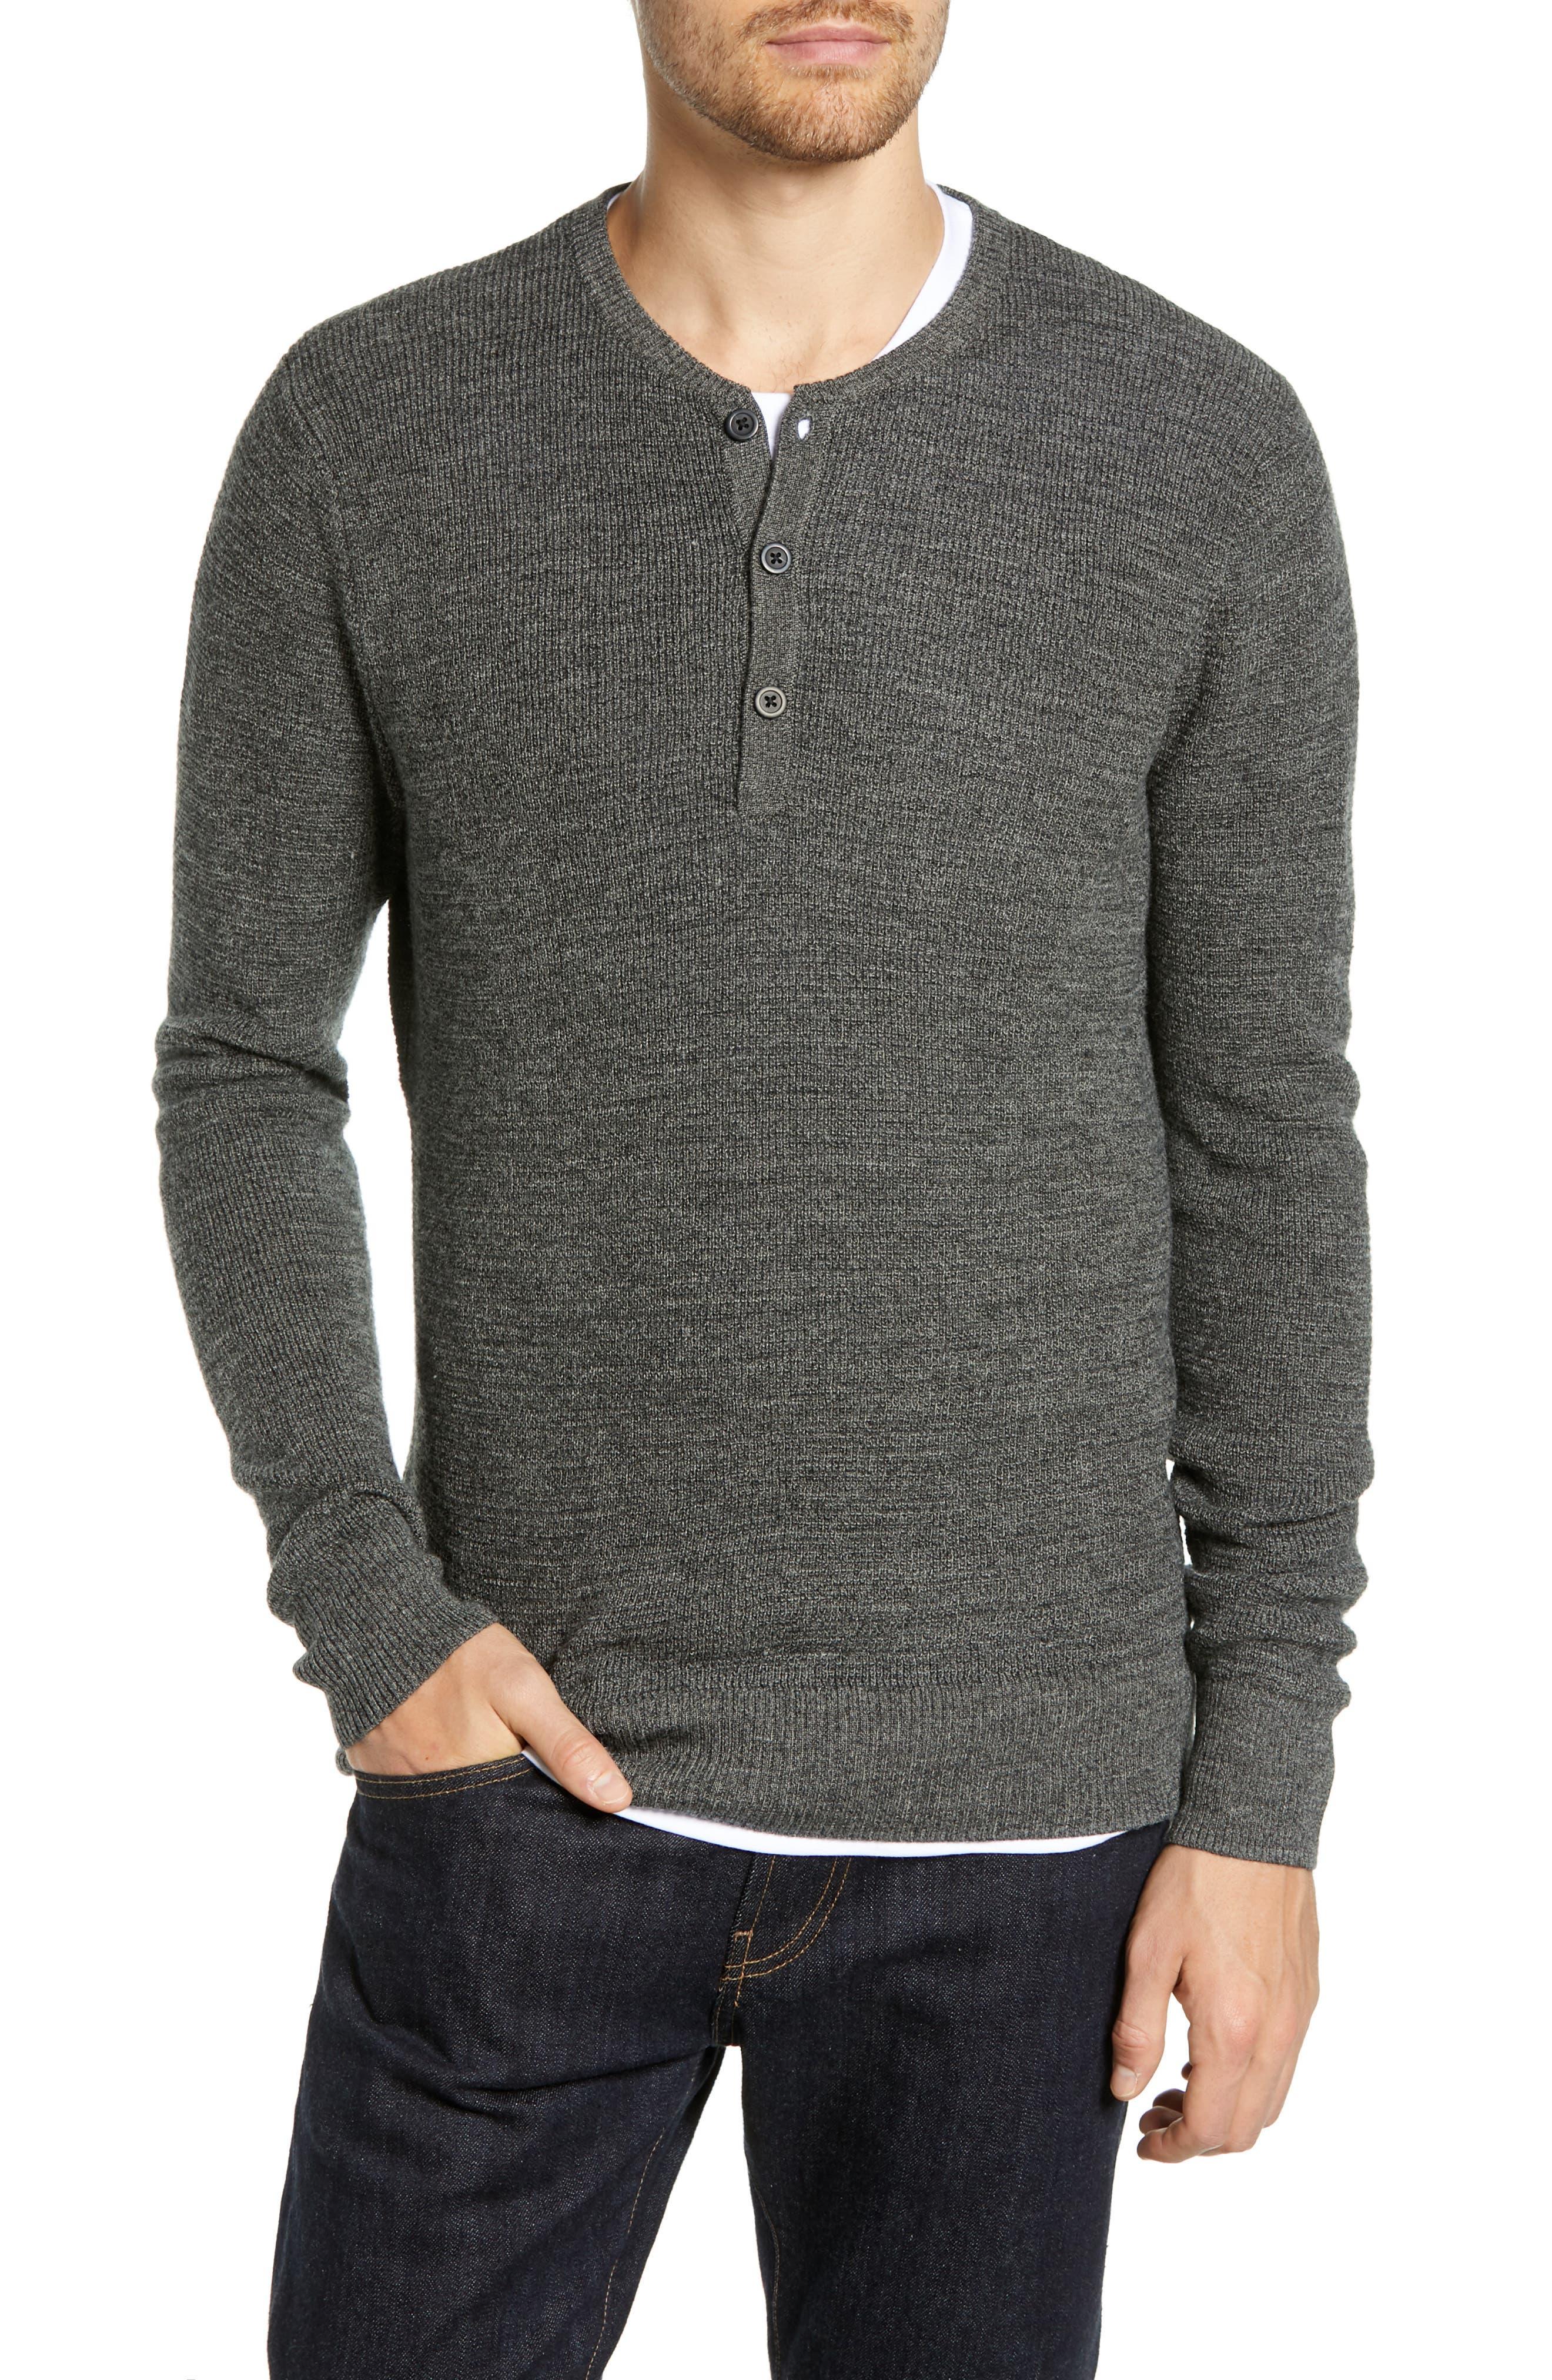 Nordstrom Shop Merino Wool Blend Thermal Henley, Grey